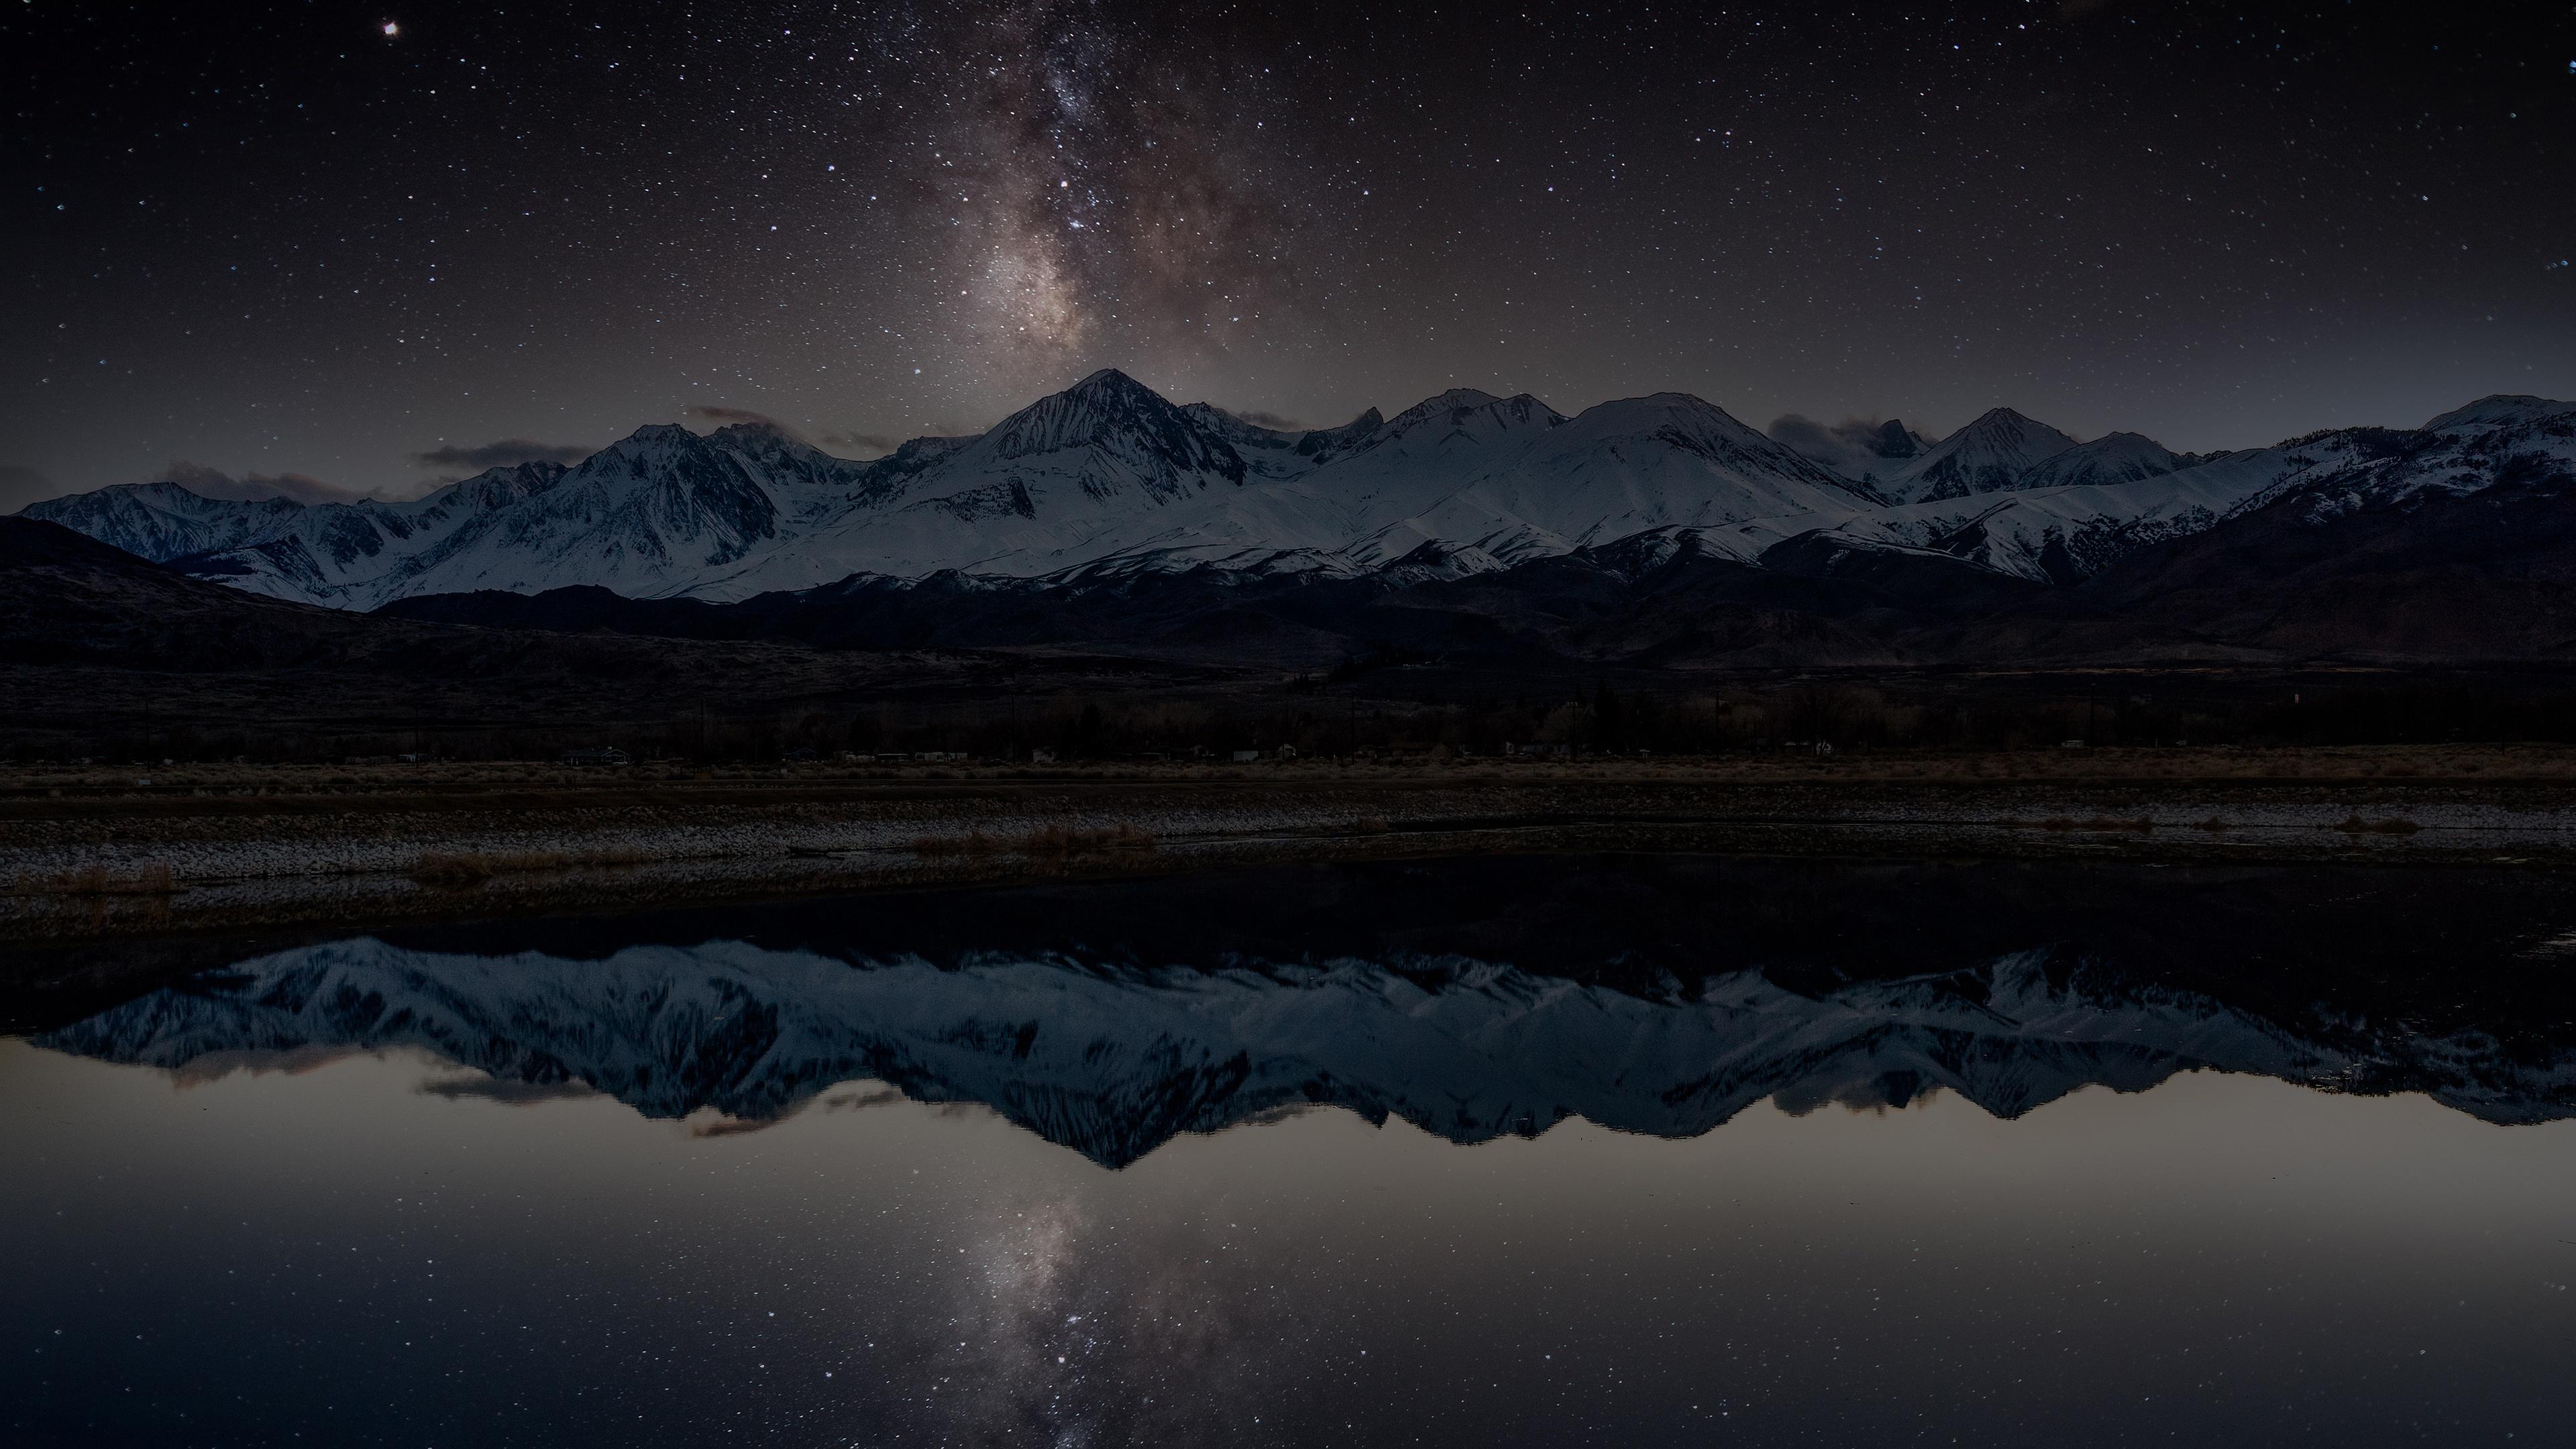 Stars Snow Mountain Lake Reflection Milky Way 3840x2160